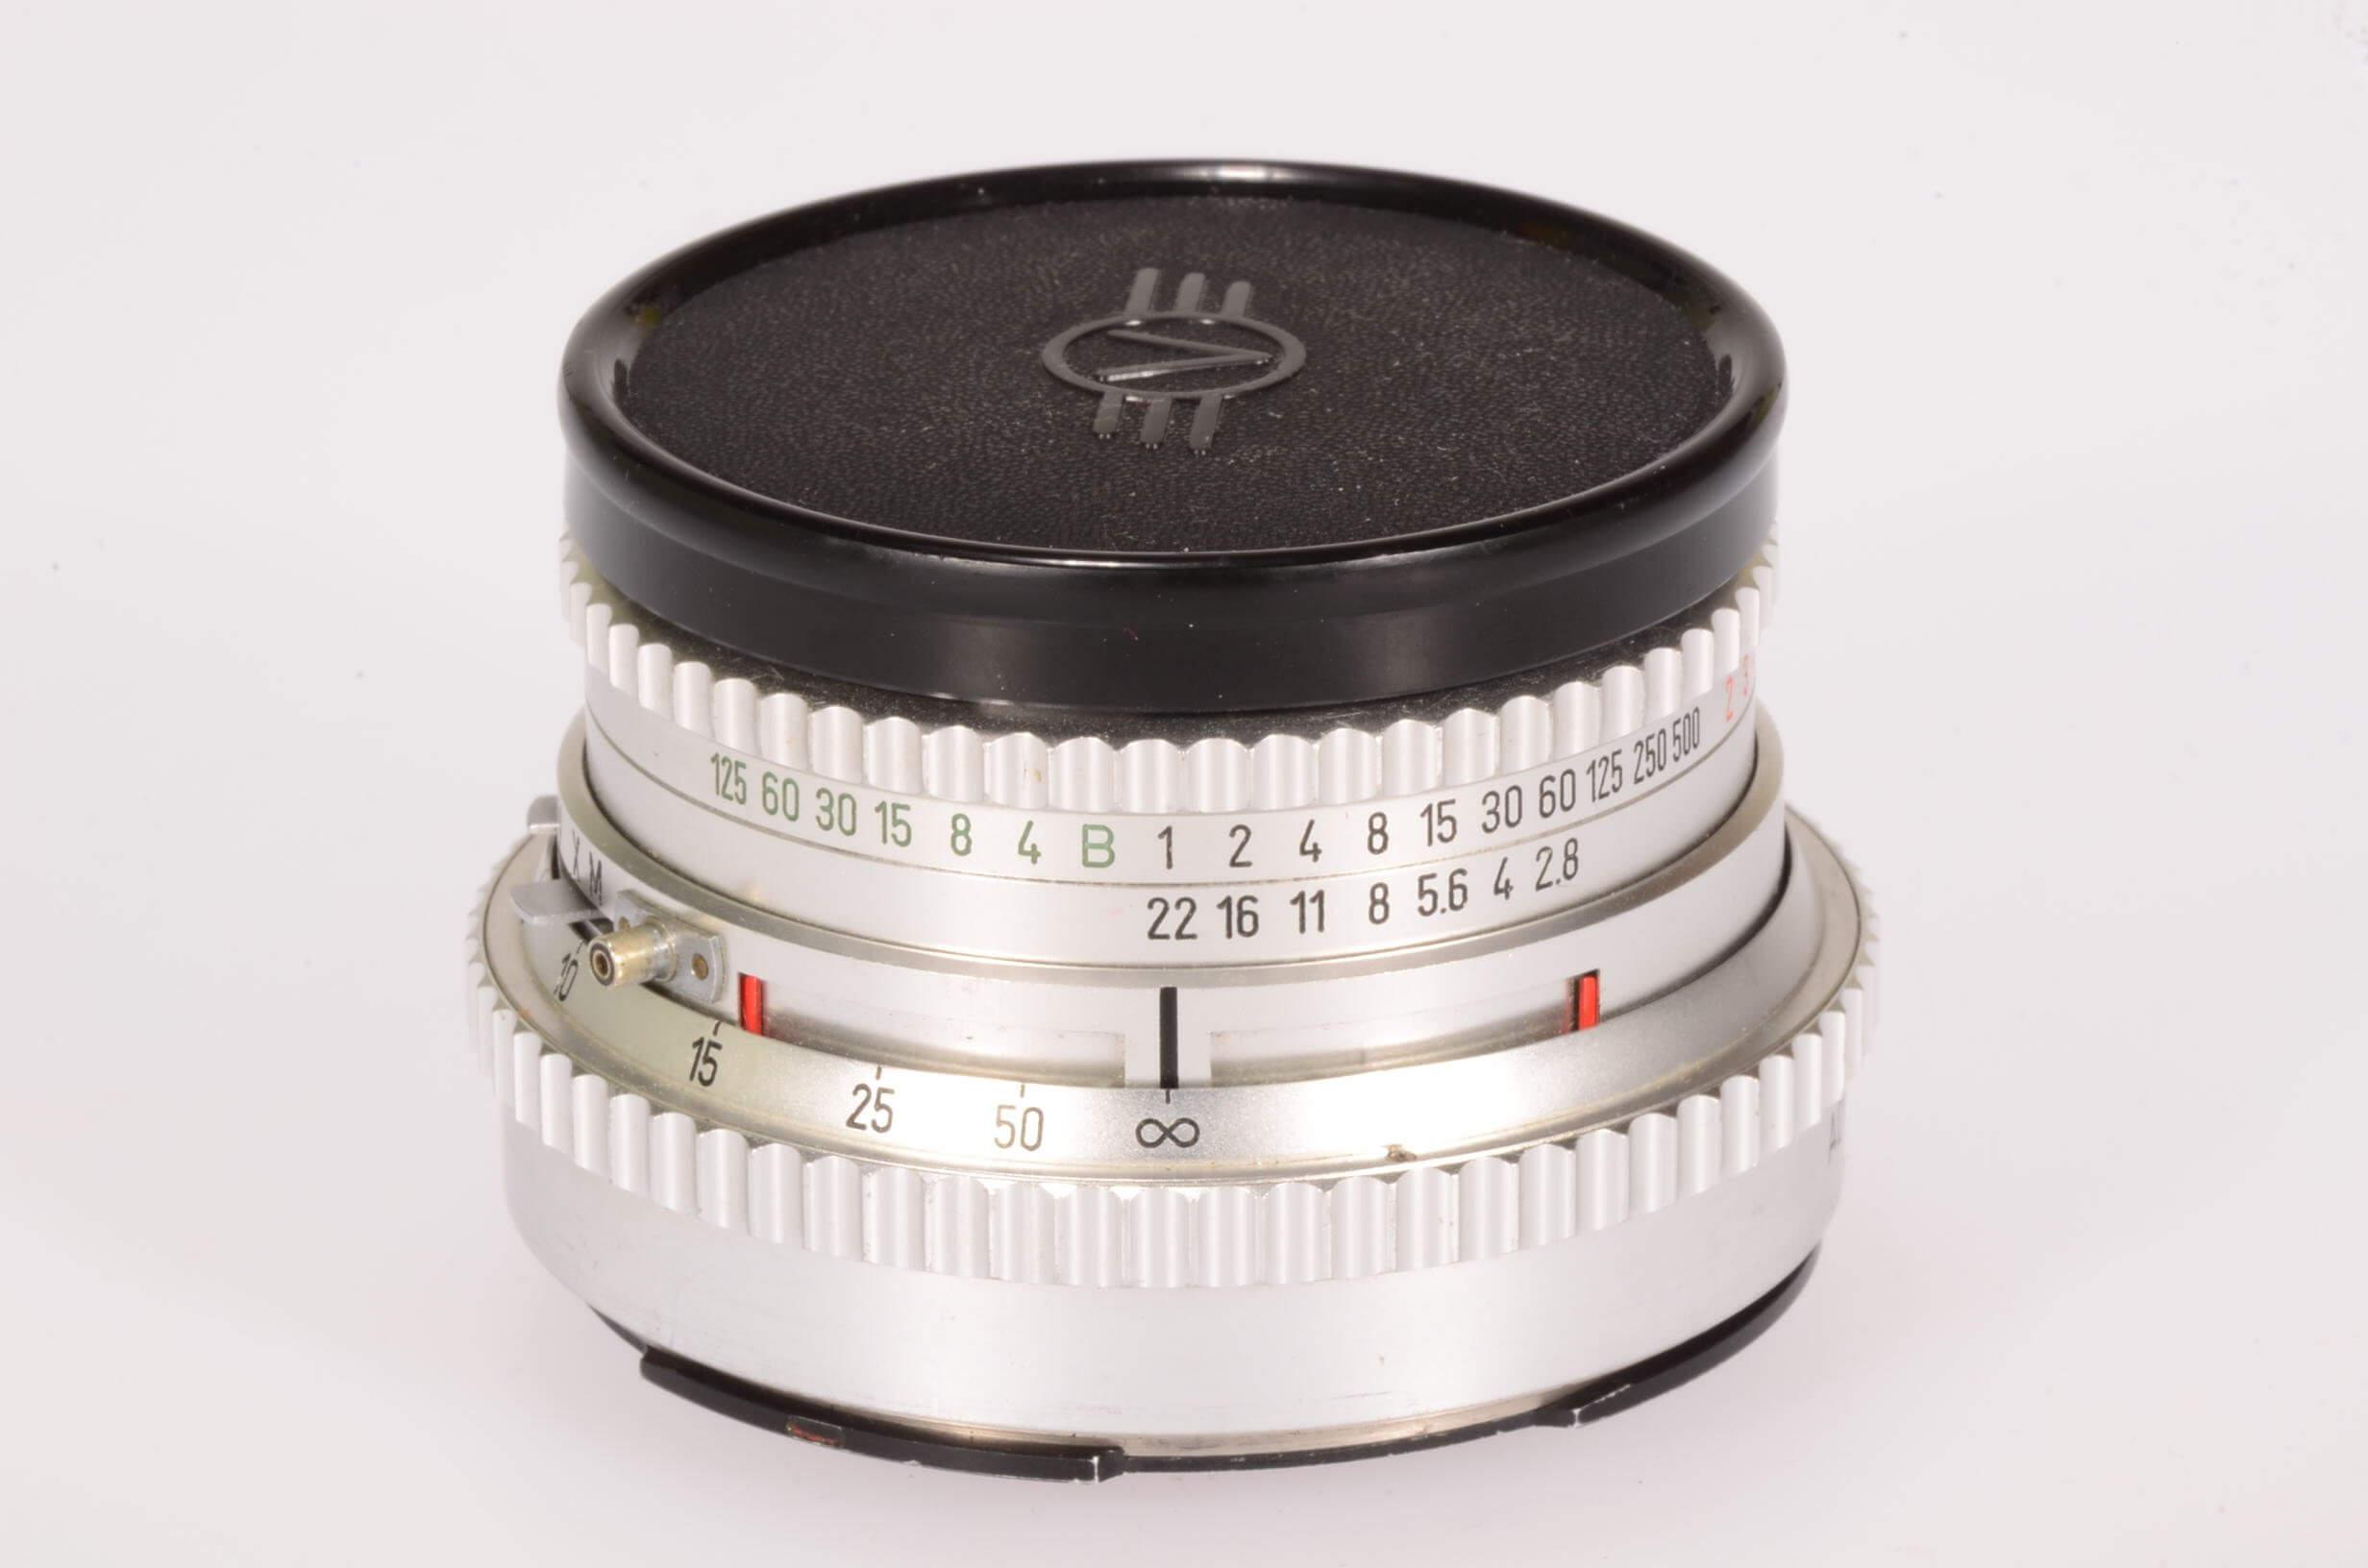 Hasselblad 80mm f2.8 Planar C